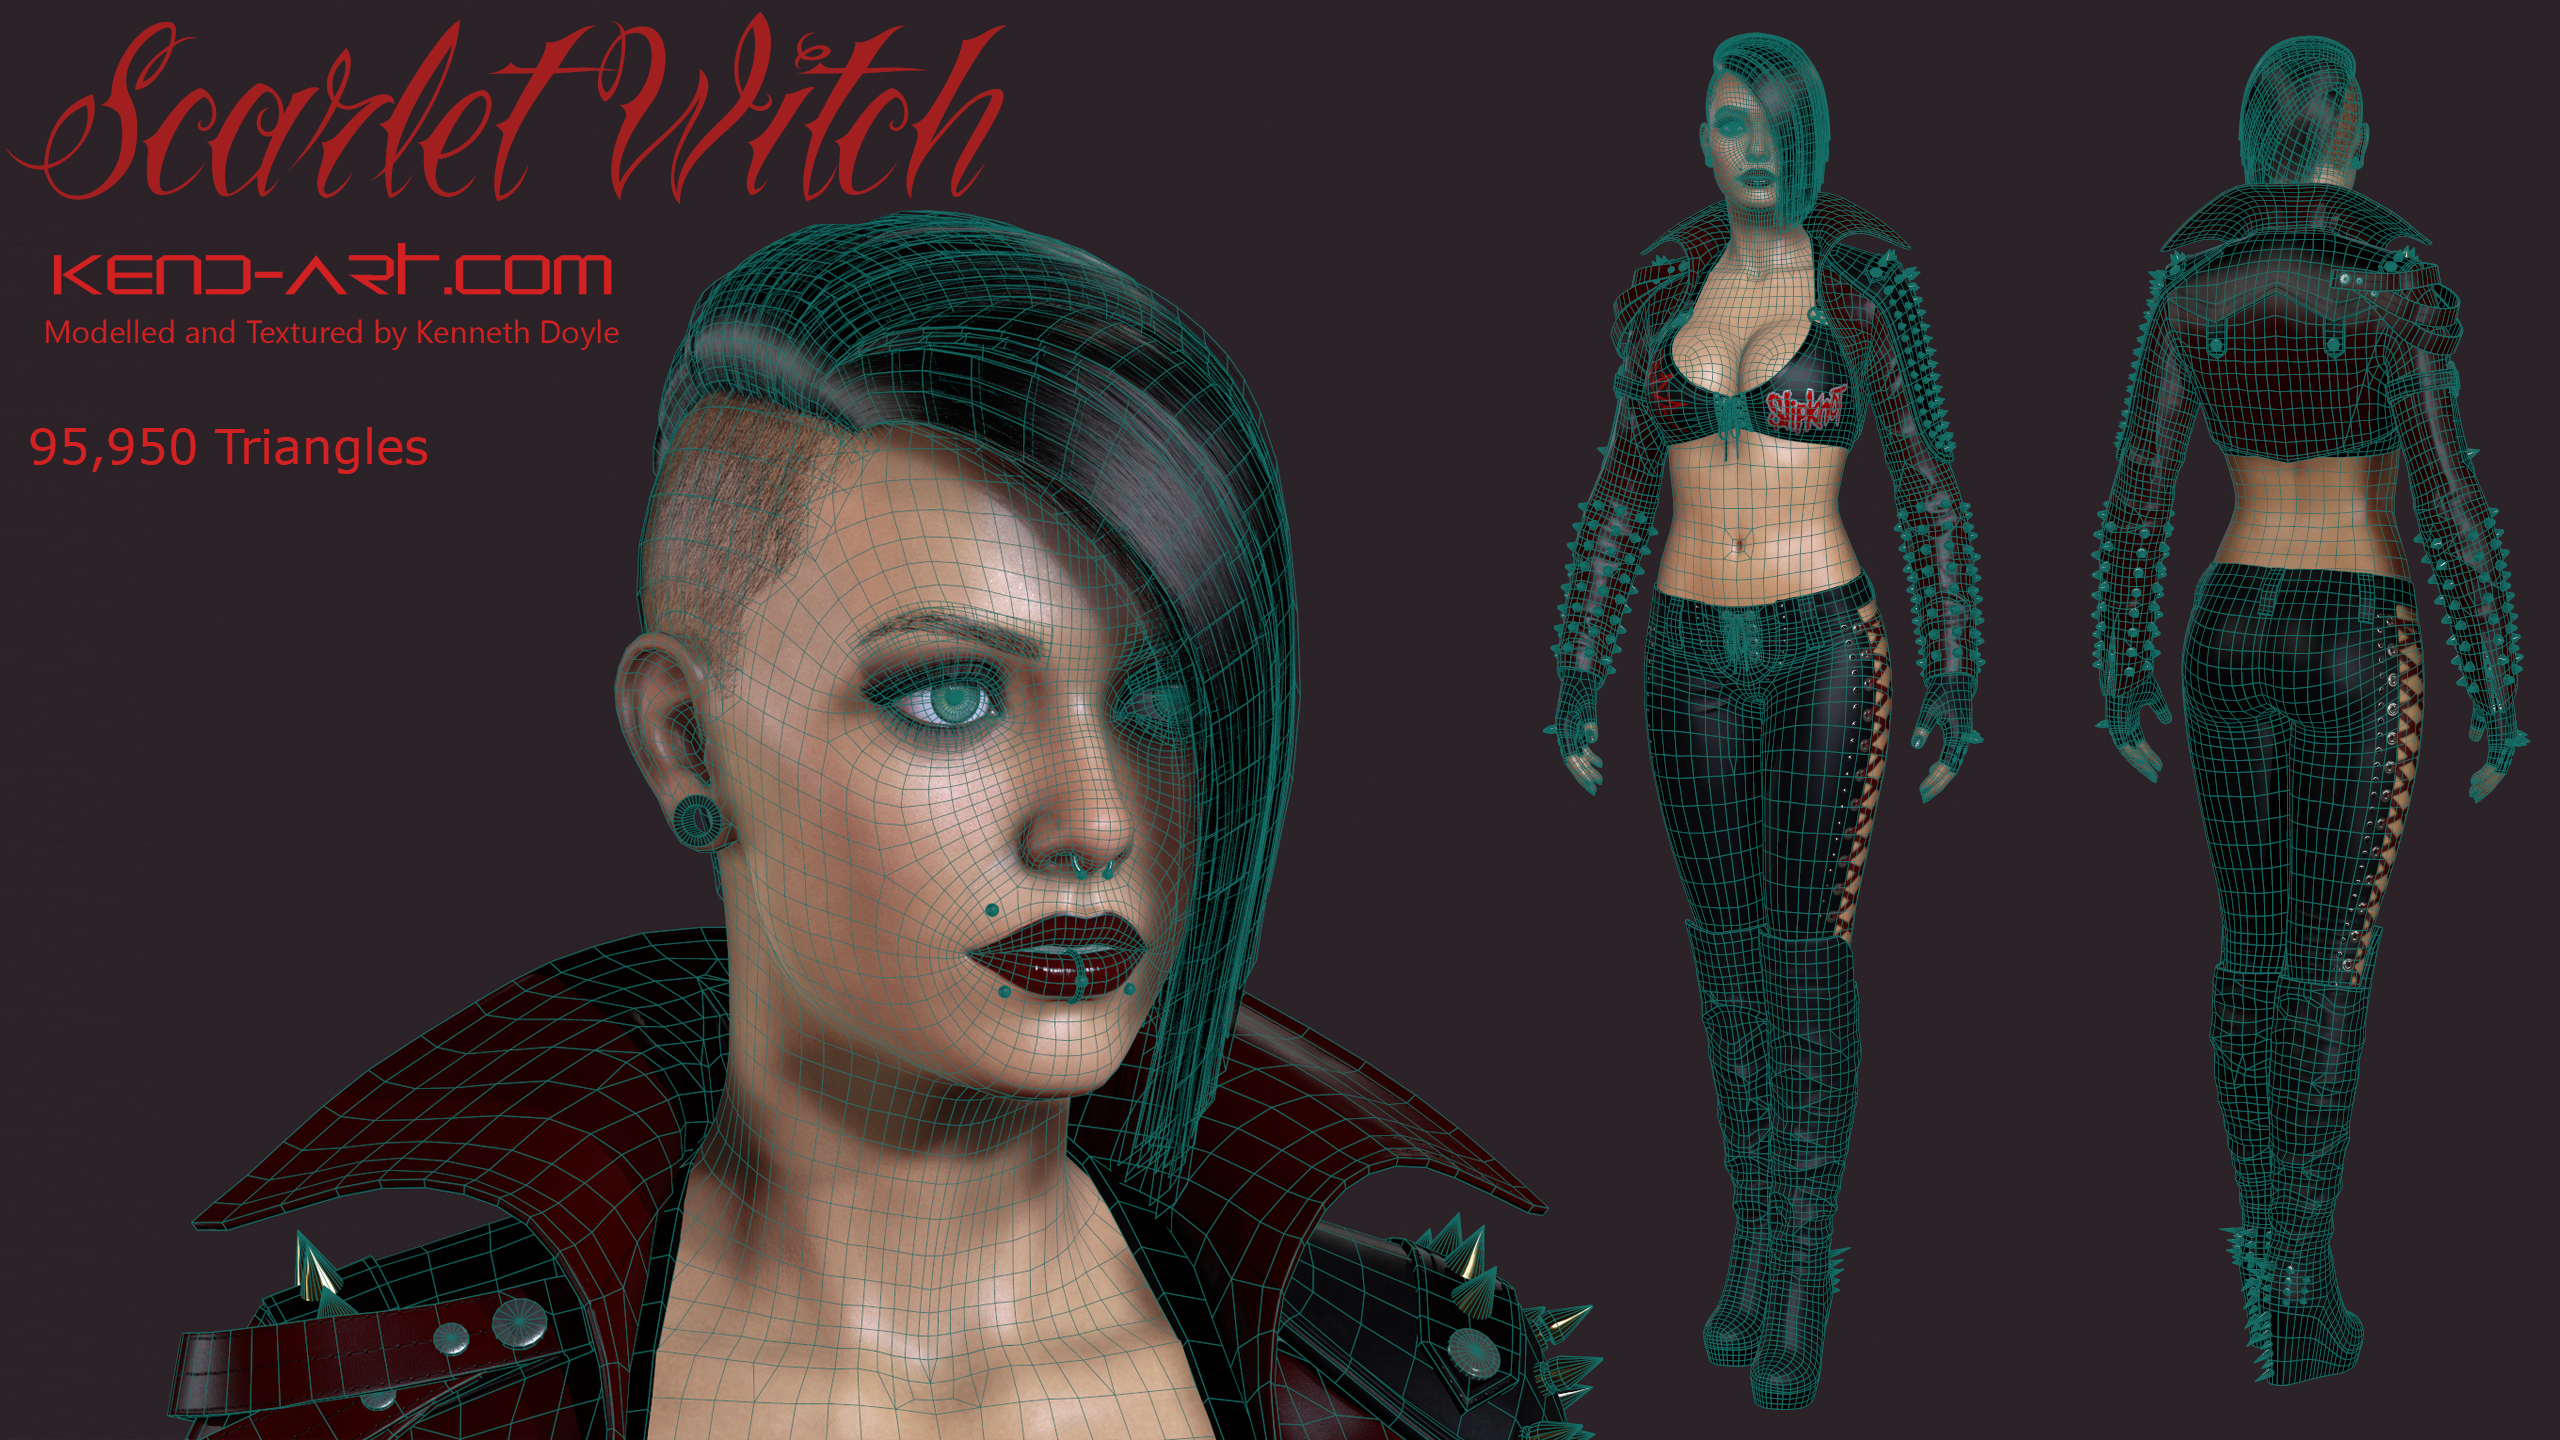 scarlet_witch_wireframe_by_kdoyle9-d953c37.jpg